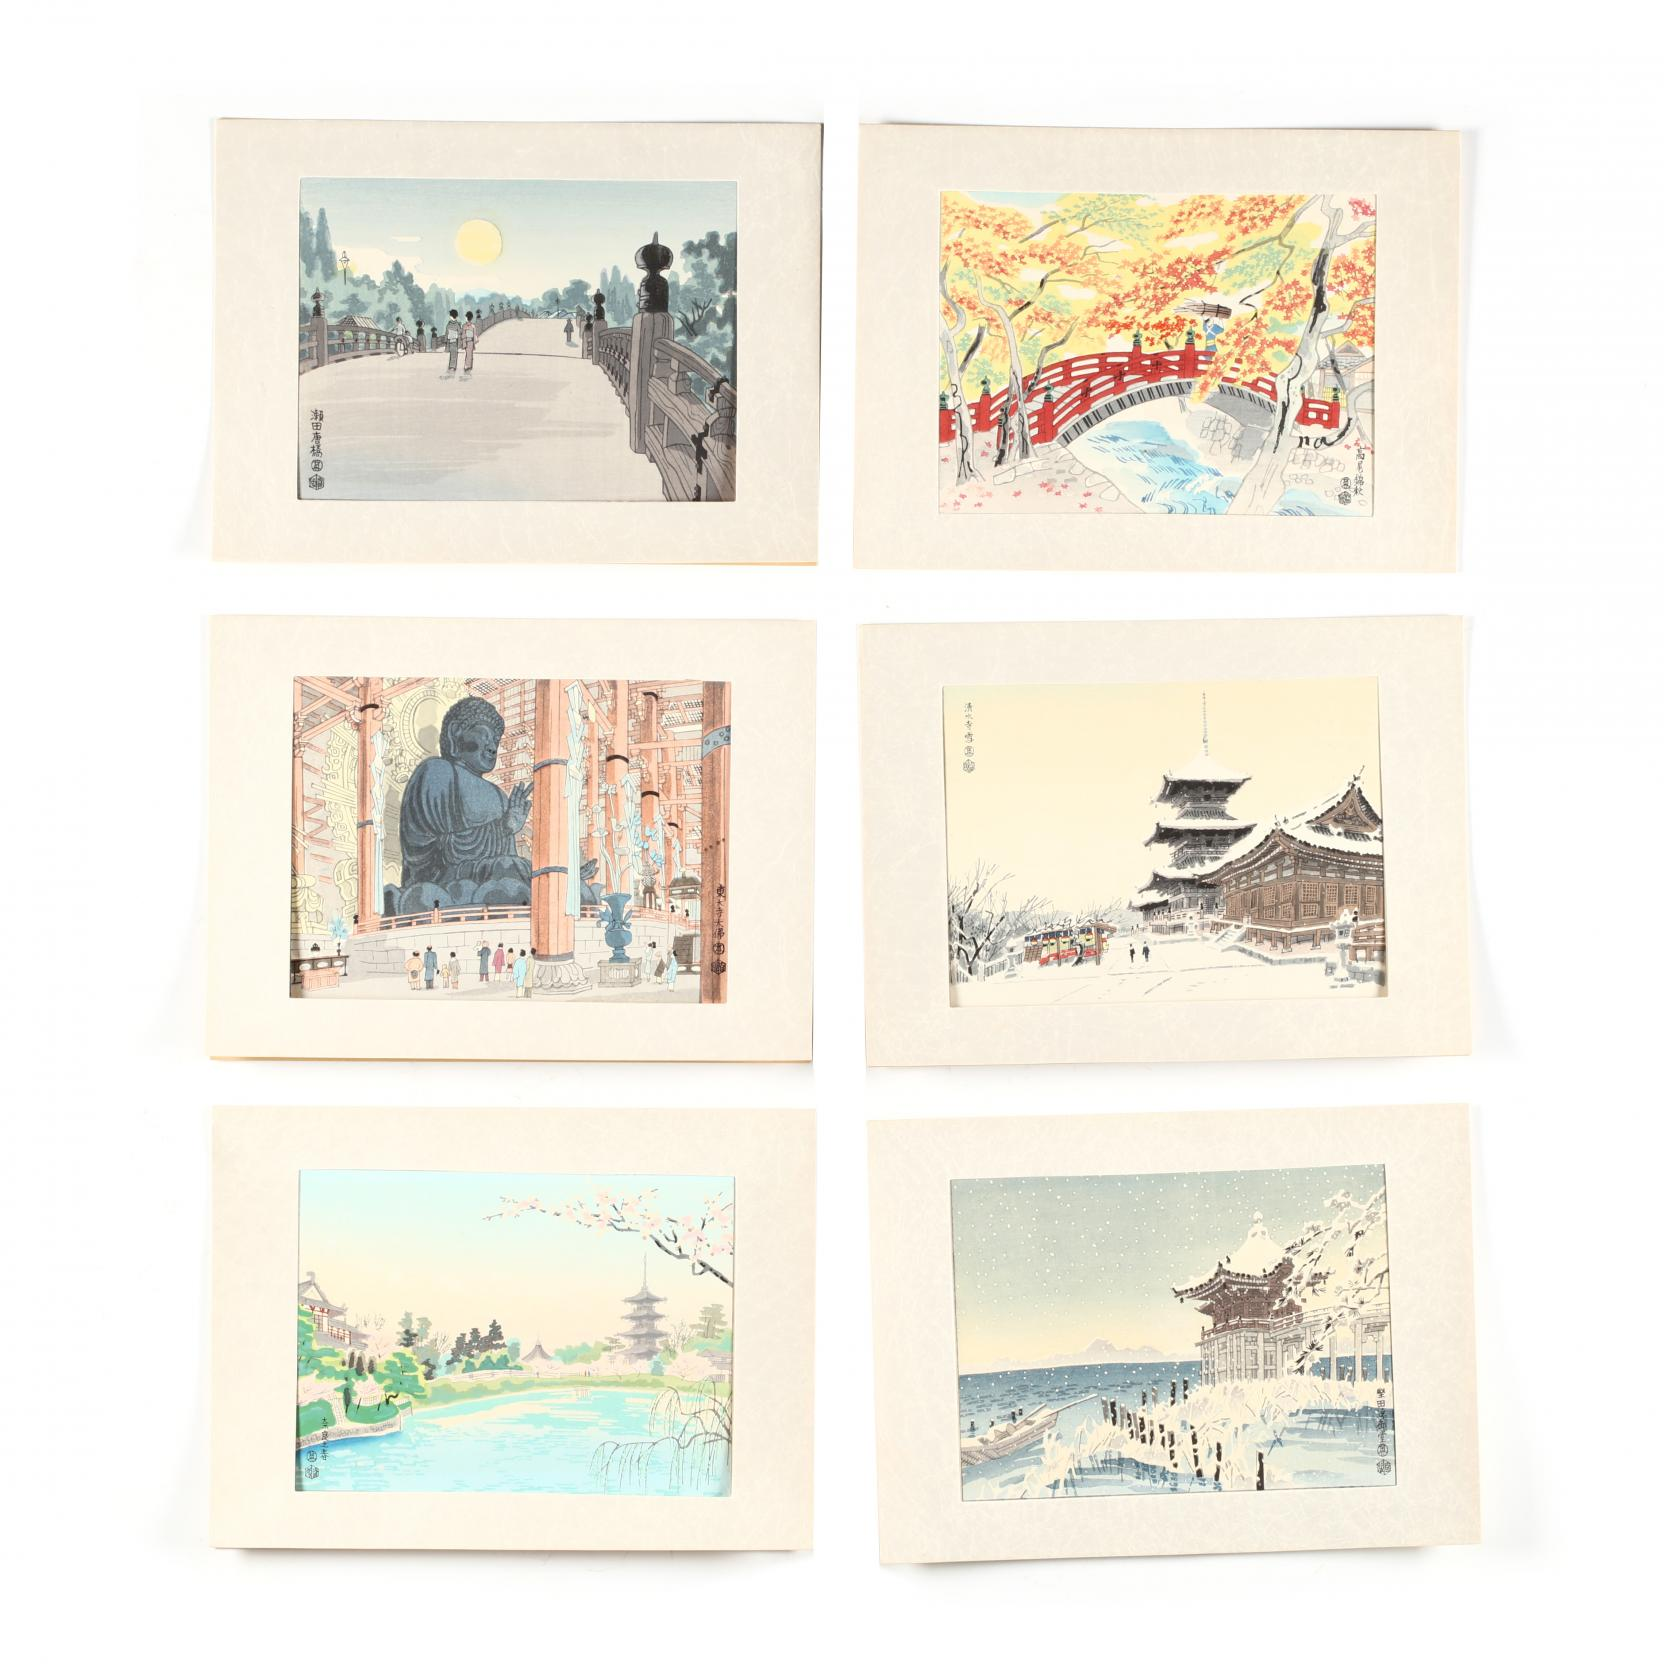 eiichi-kotozuka-japanese-1906-1979-a-portfolio-of-i-the-scenes-of-shiga-nara-and-kyoto-i